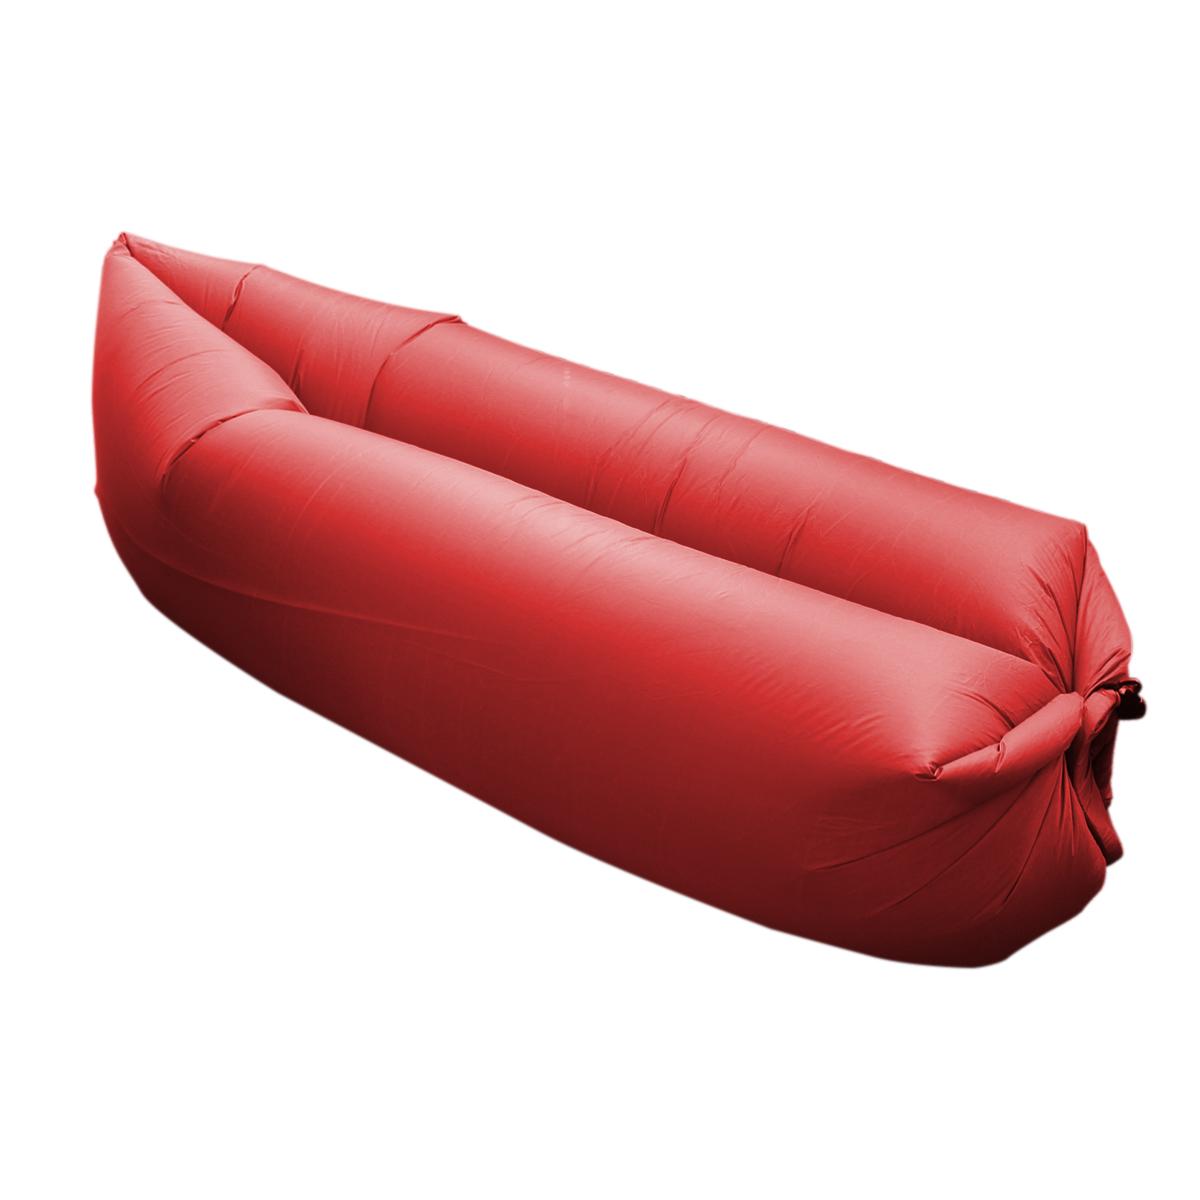 Nafukovací vak MASTER Lazy Air - červený